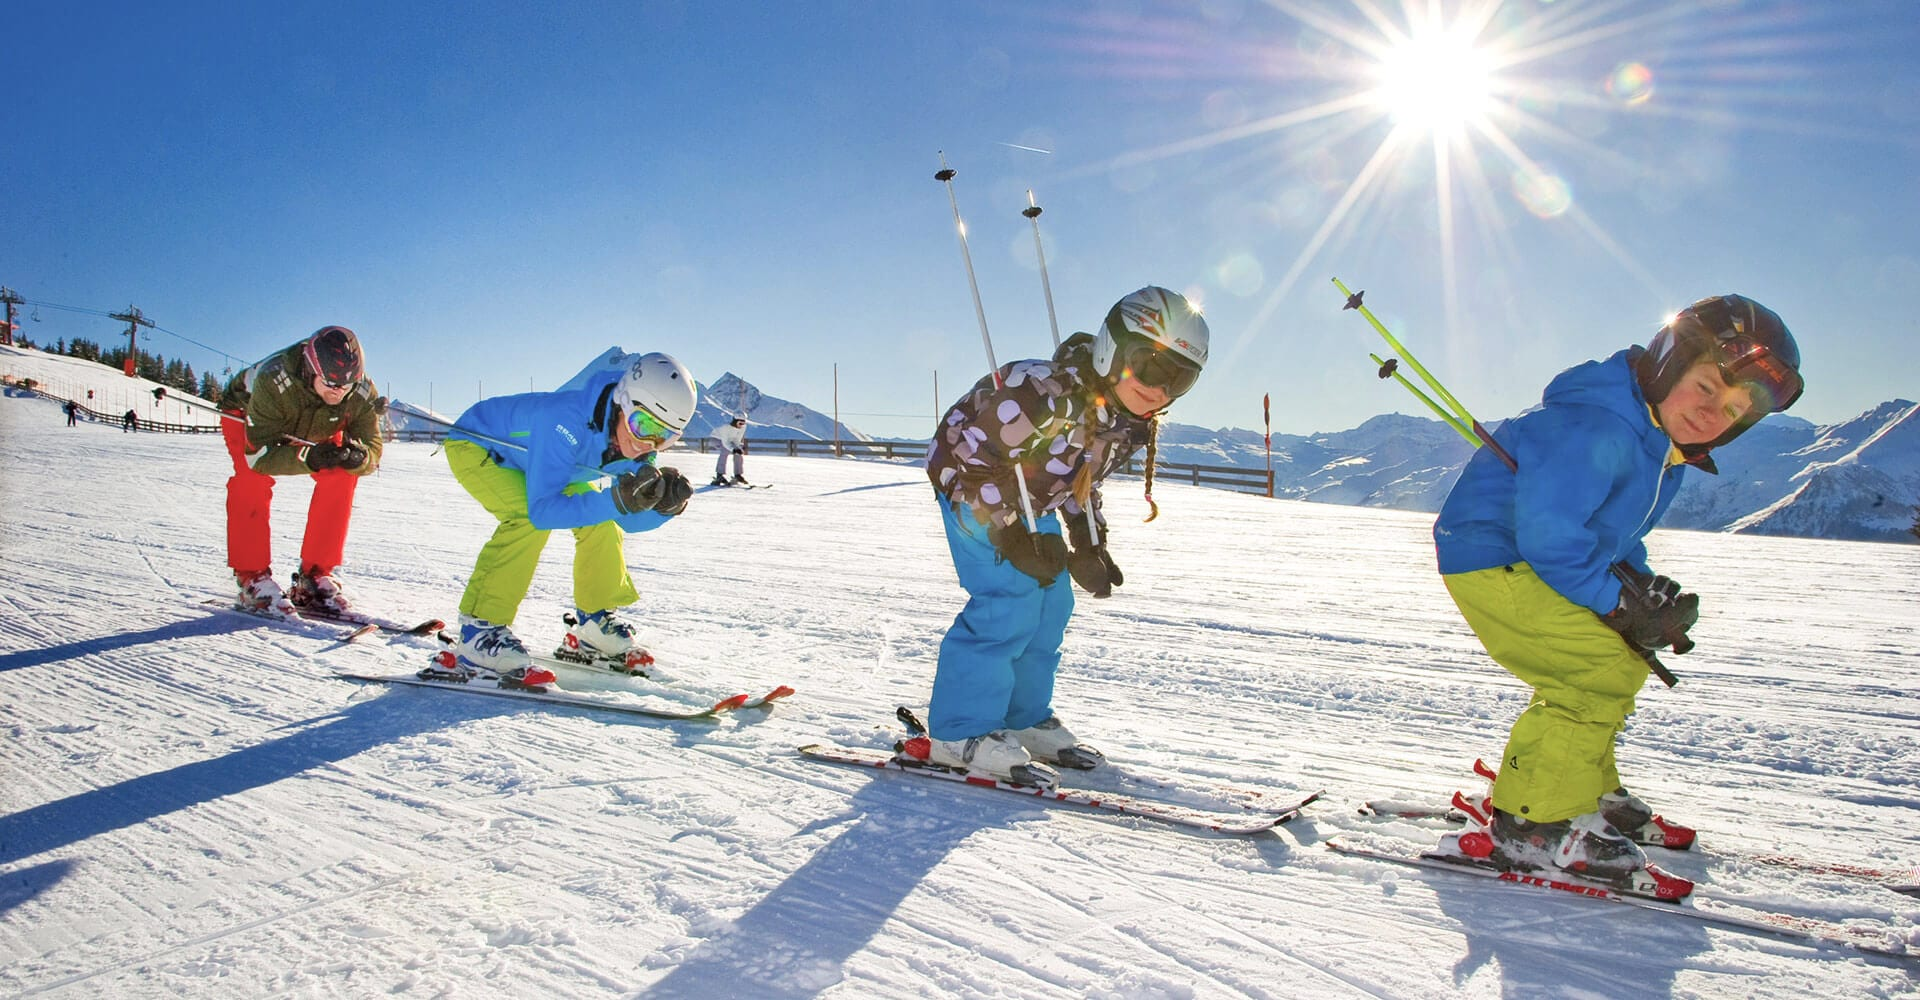 Winterurlaub & Skiurlaub in Großarl, Ski amadé –Reitbauernhof